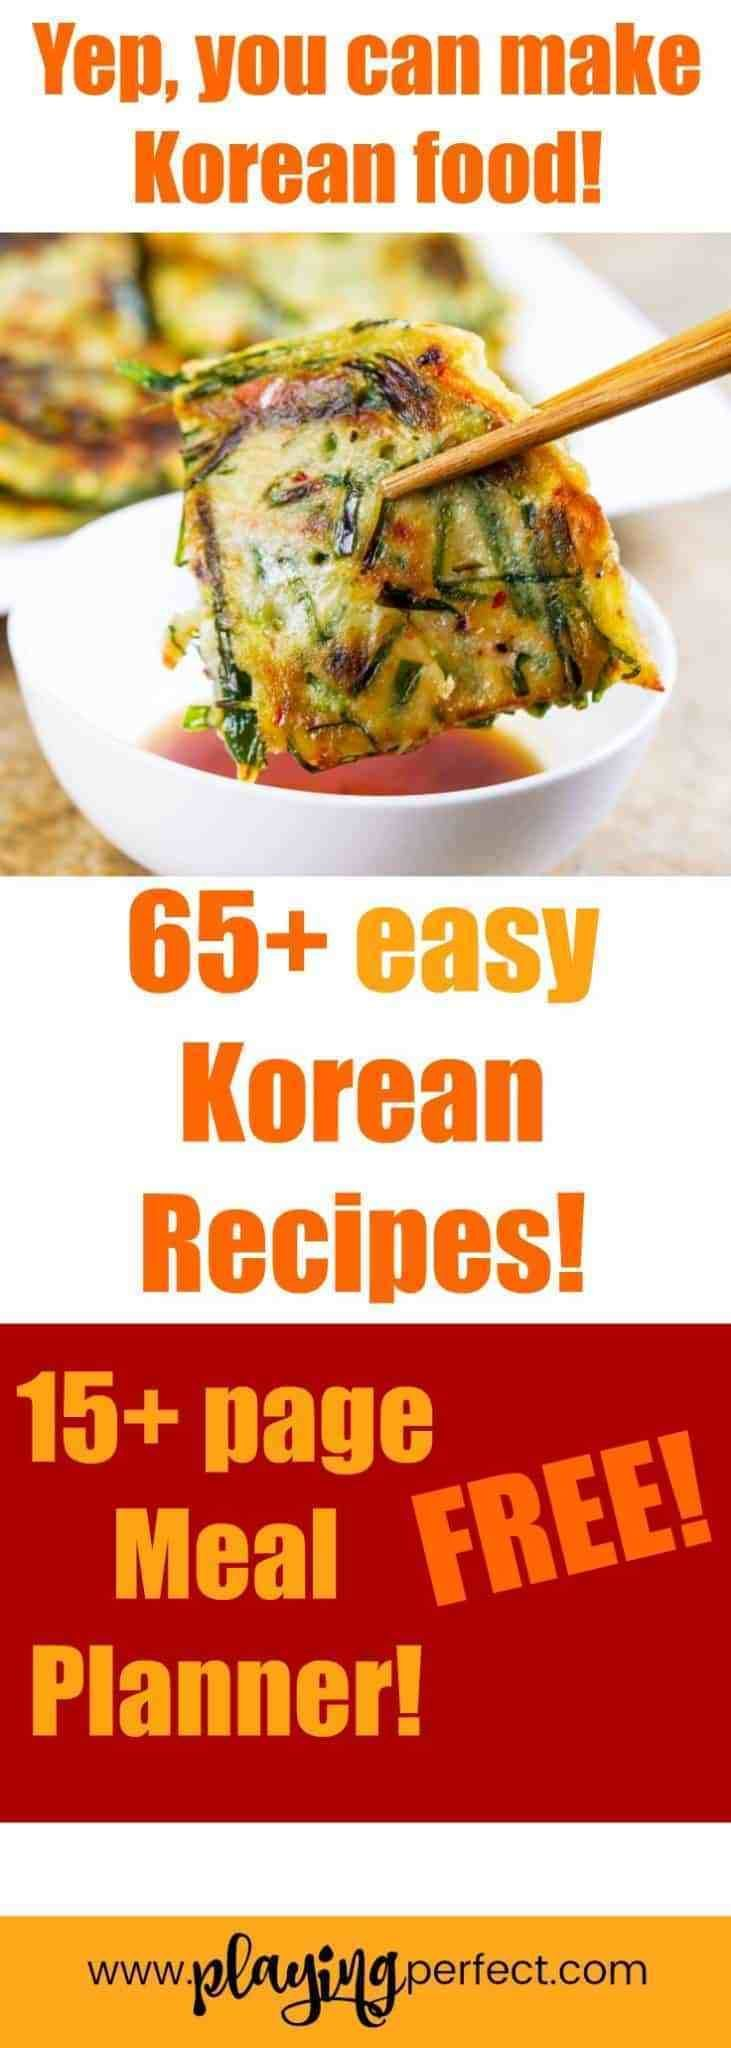 Easy Korean recipe ideas! Here are Korean dinner ideas, Korean instant pot recipes, vegan Korean food, and quick Korean recipes too! FREE Meal Planning printable pack included! | playingperfect.com | #koreanfood #korean #kore #Abnehmen #chinese food #essen ideen #food ideas #italian food #korean food #mexican food